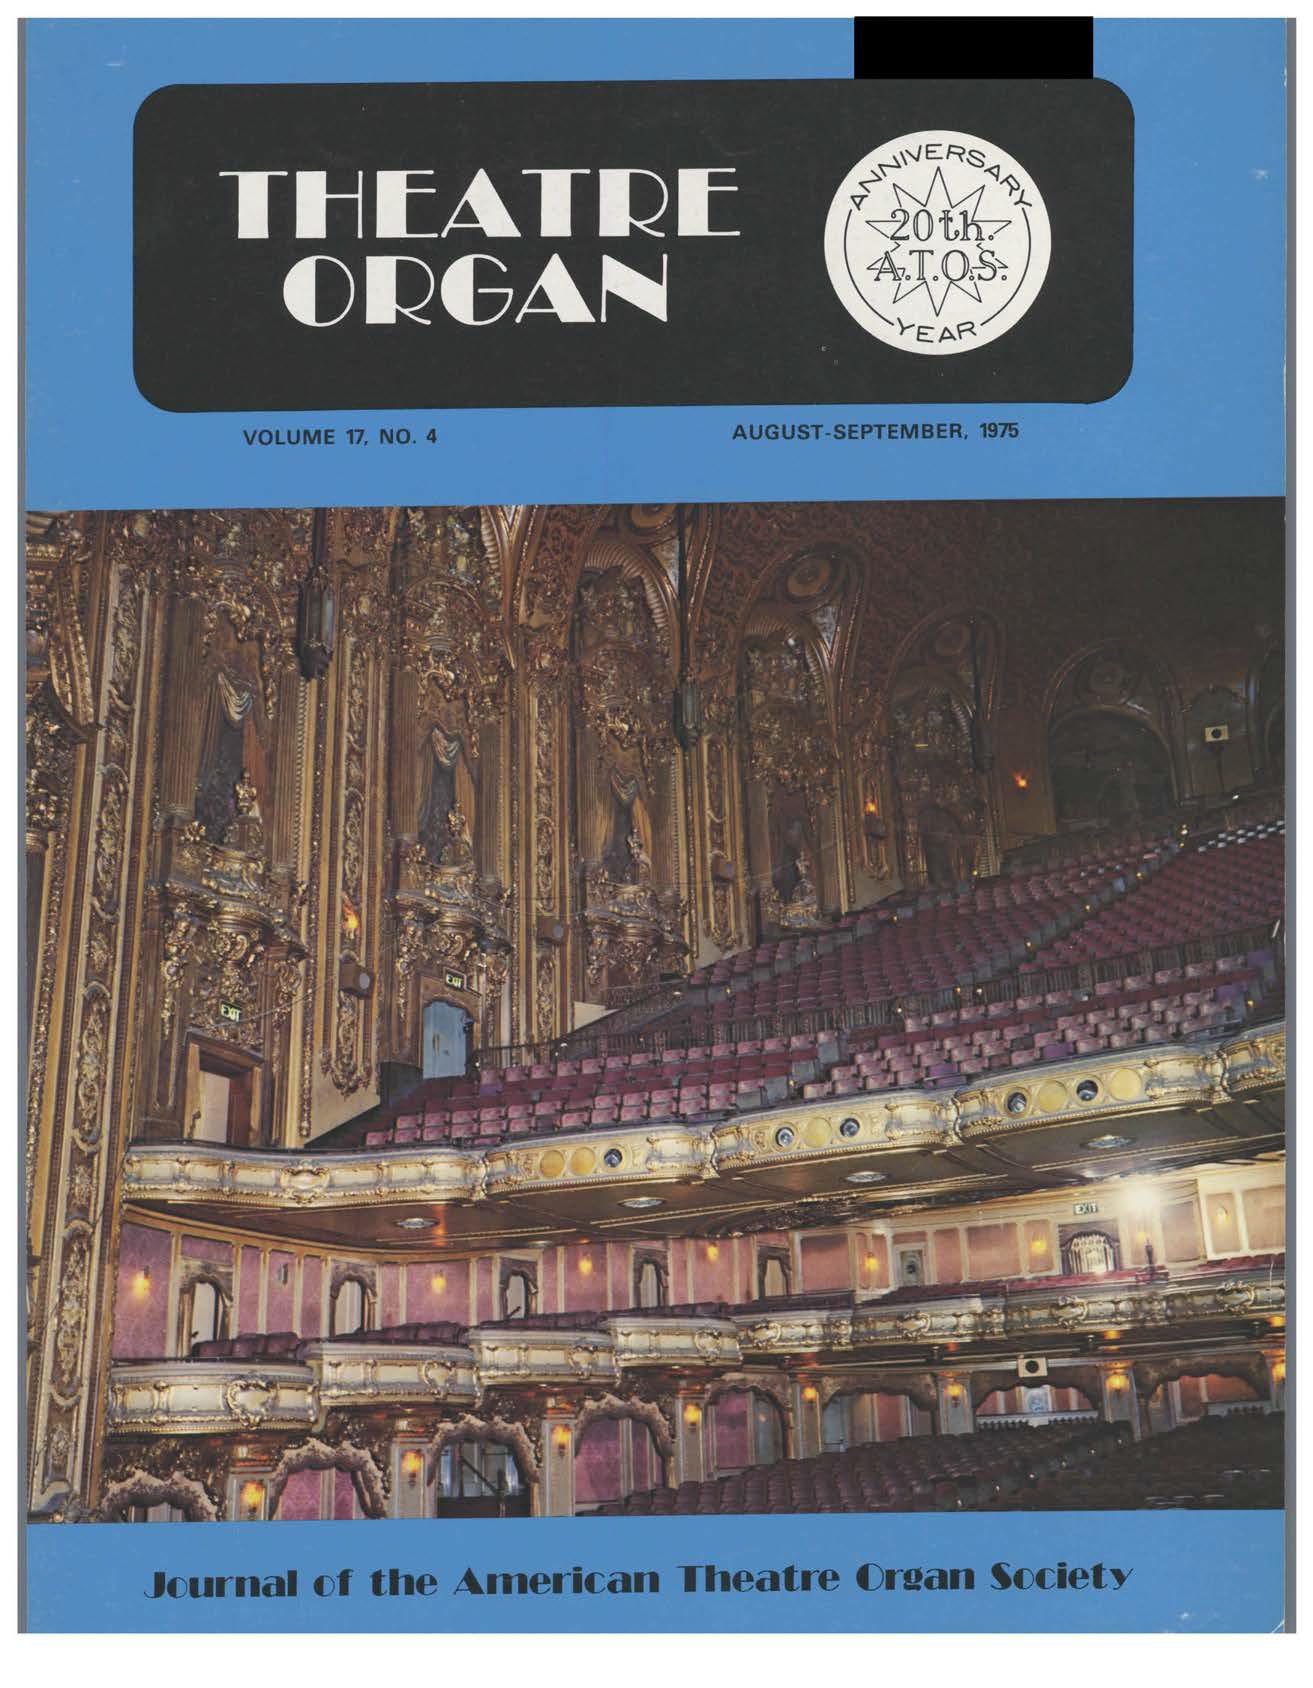 Theatre Organ, August - September 1975, Volume 17, Number 4